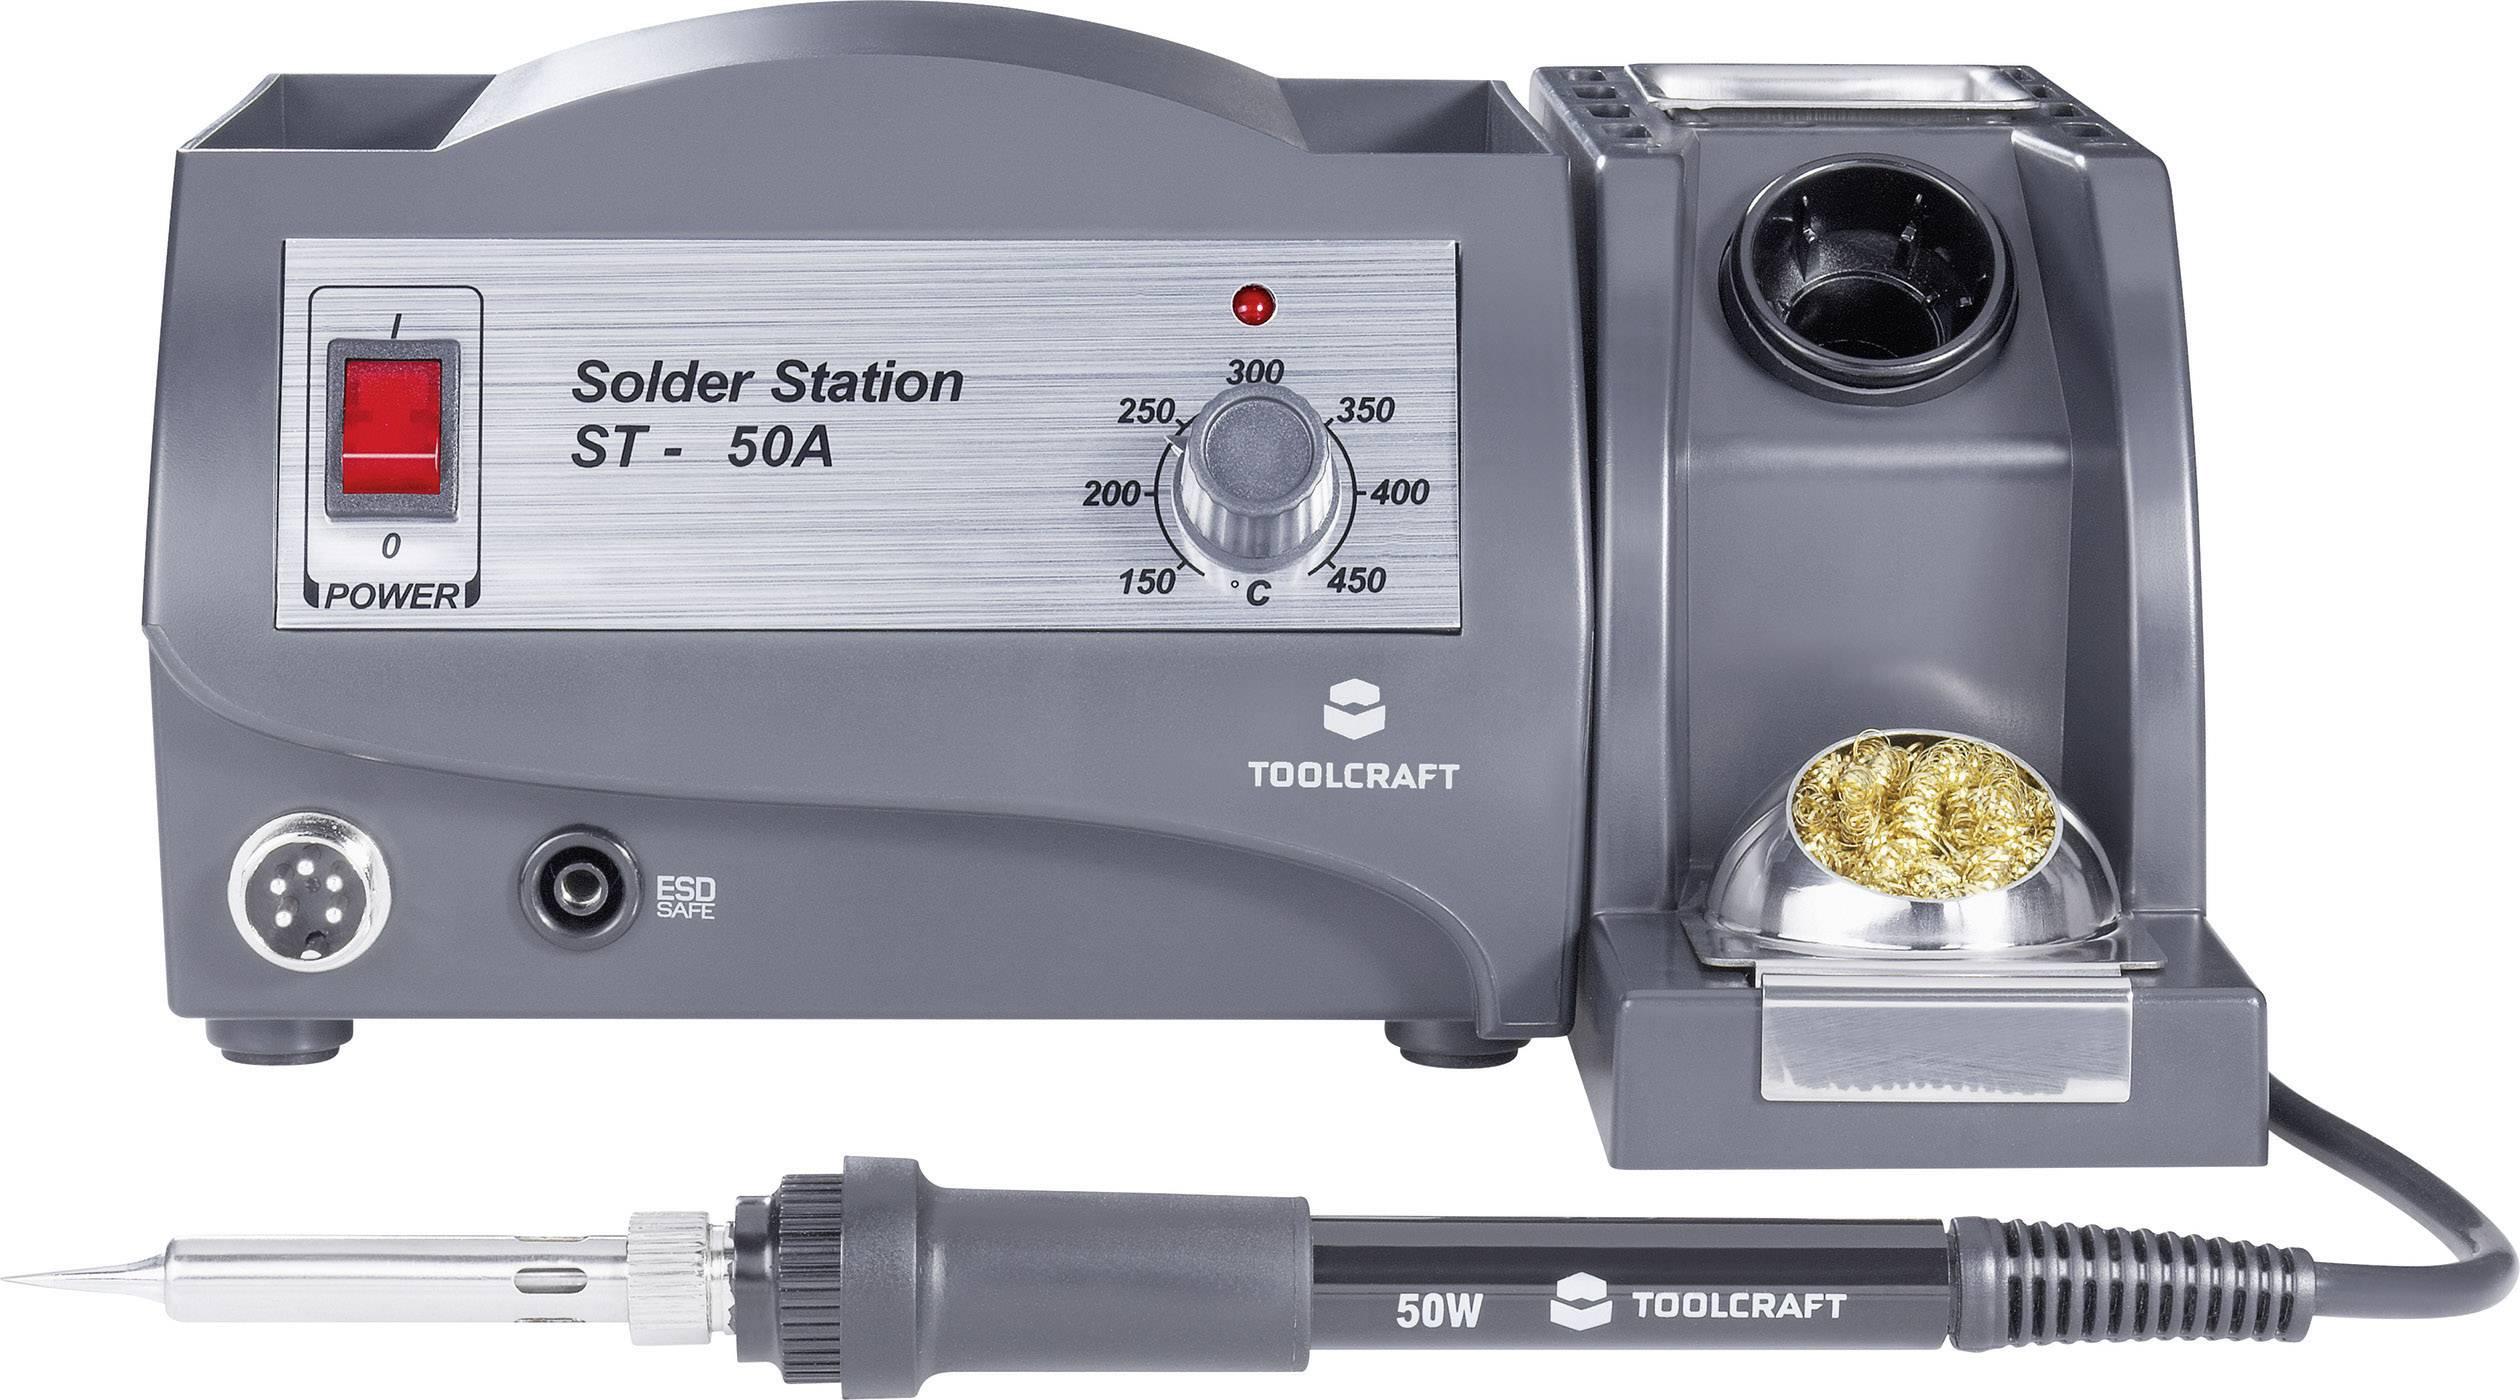 Spájkovacia stanica TOOLCRAFT 791784, analógový, 50 W, +150 do +450 °C